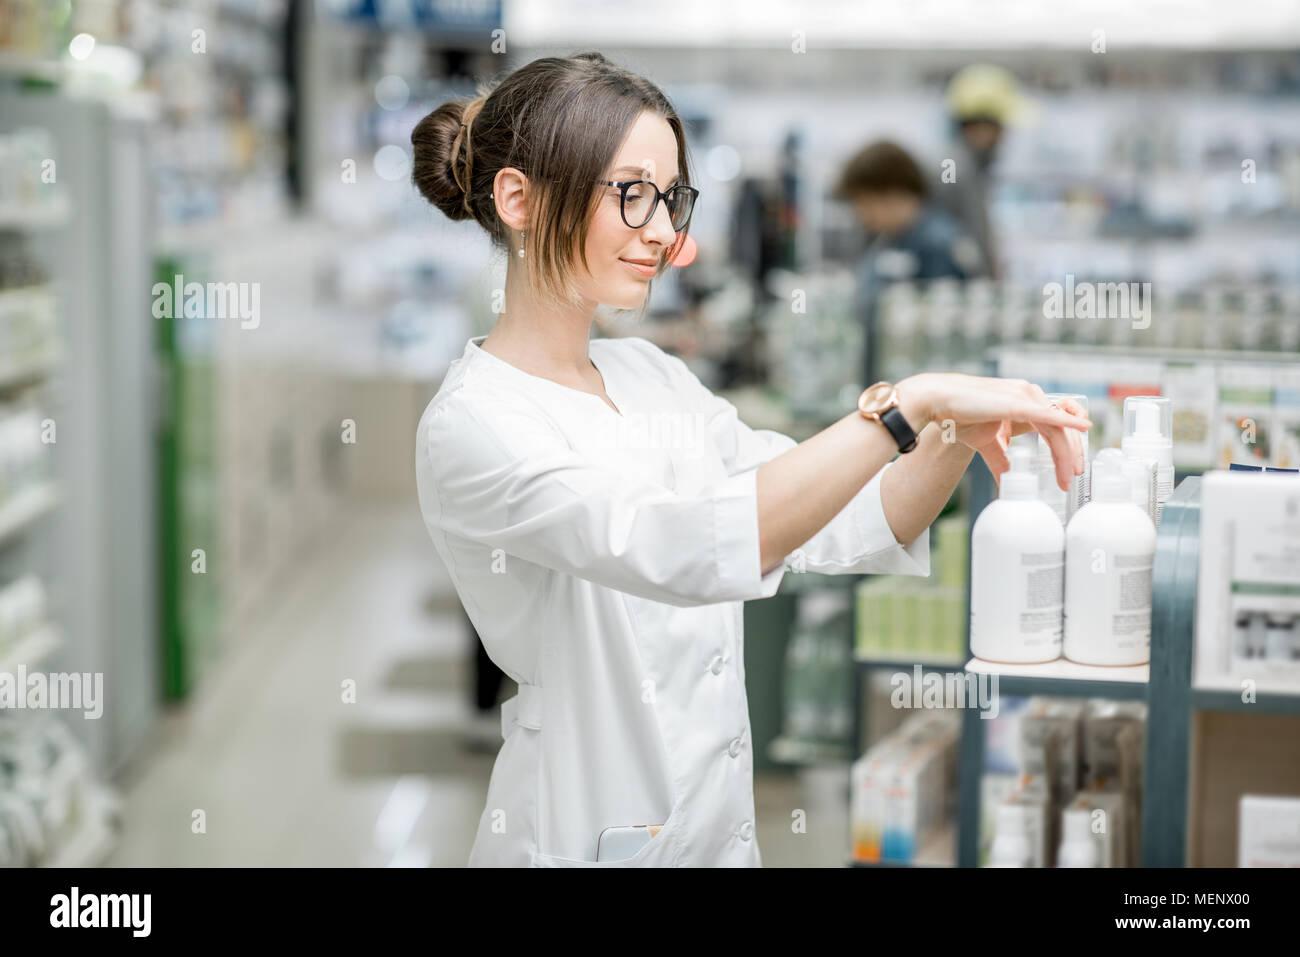 Apotheker arbeiten in der Apotheke Stockbild